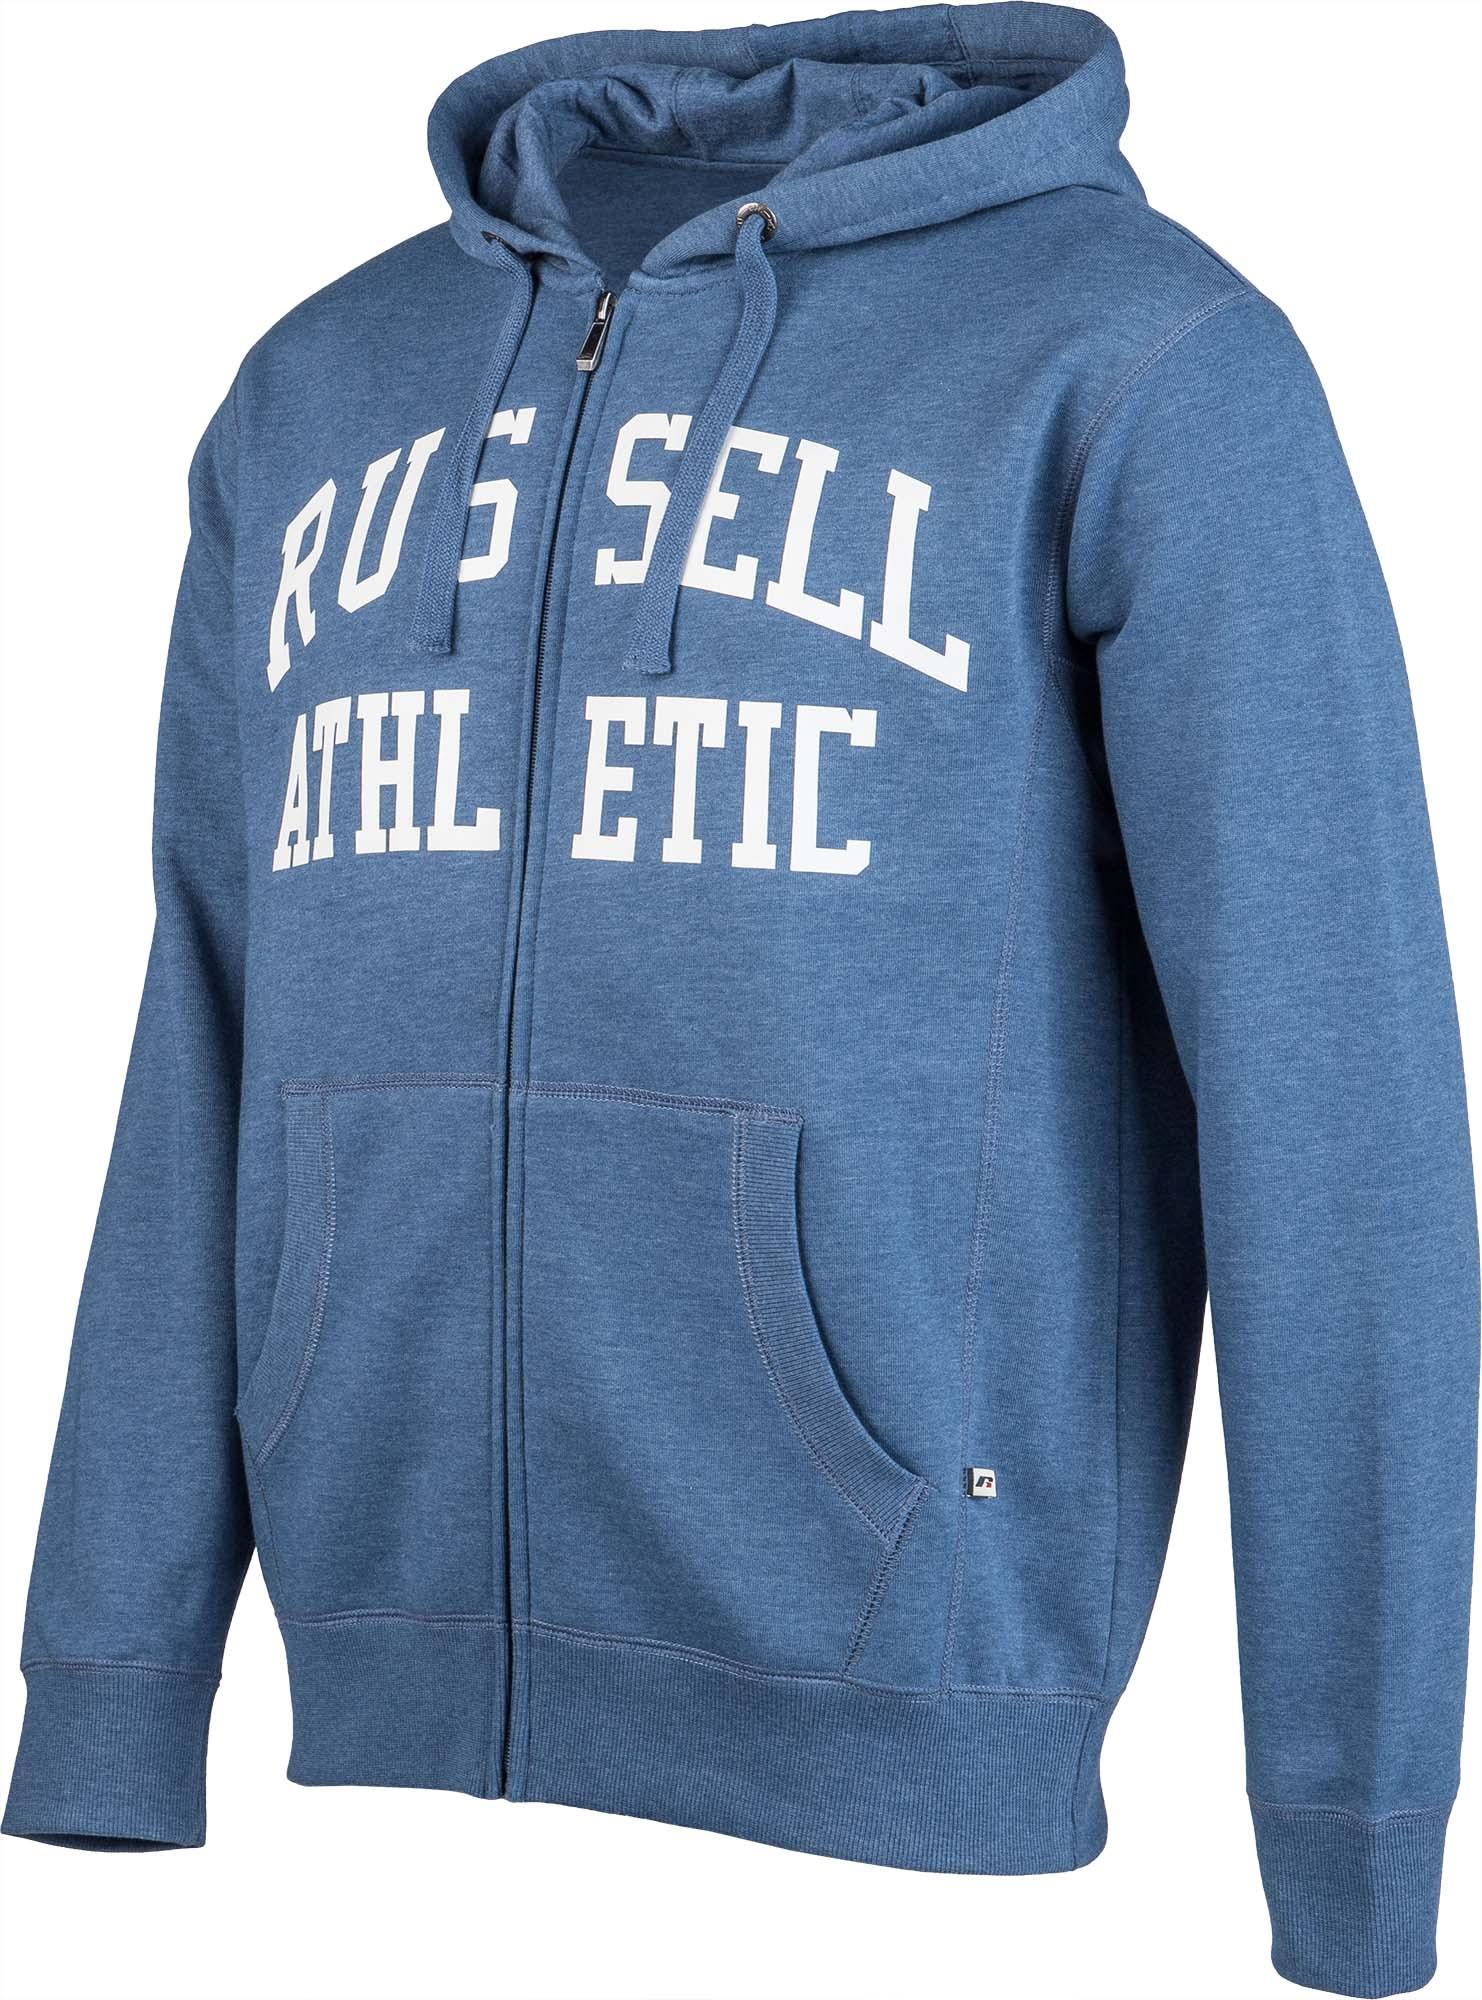 Russell Athletic PÁNSKÁ MIKINA HOODY  e8f81a41f71